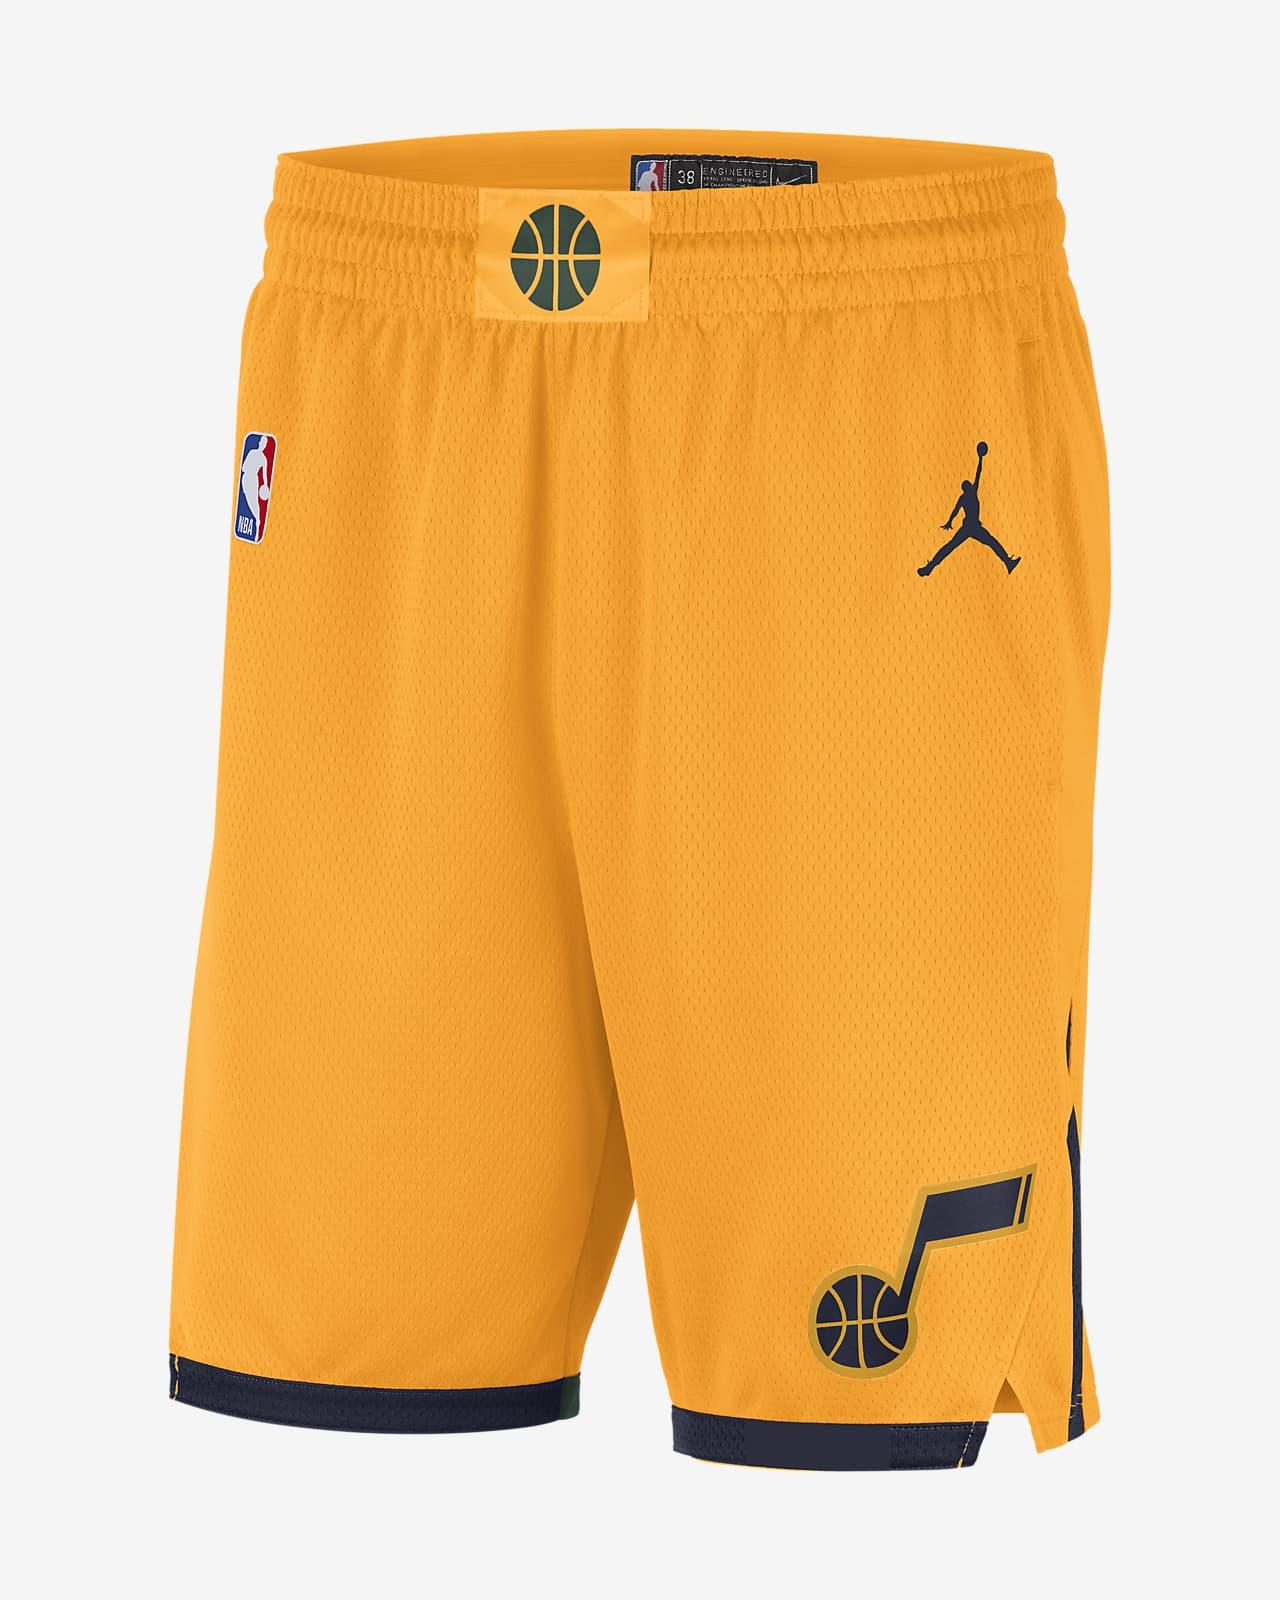 Jazz Statement Edition 2020 Jordan NBA Swingman Shorts für Herren